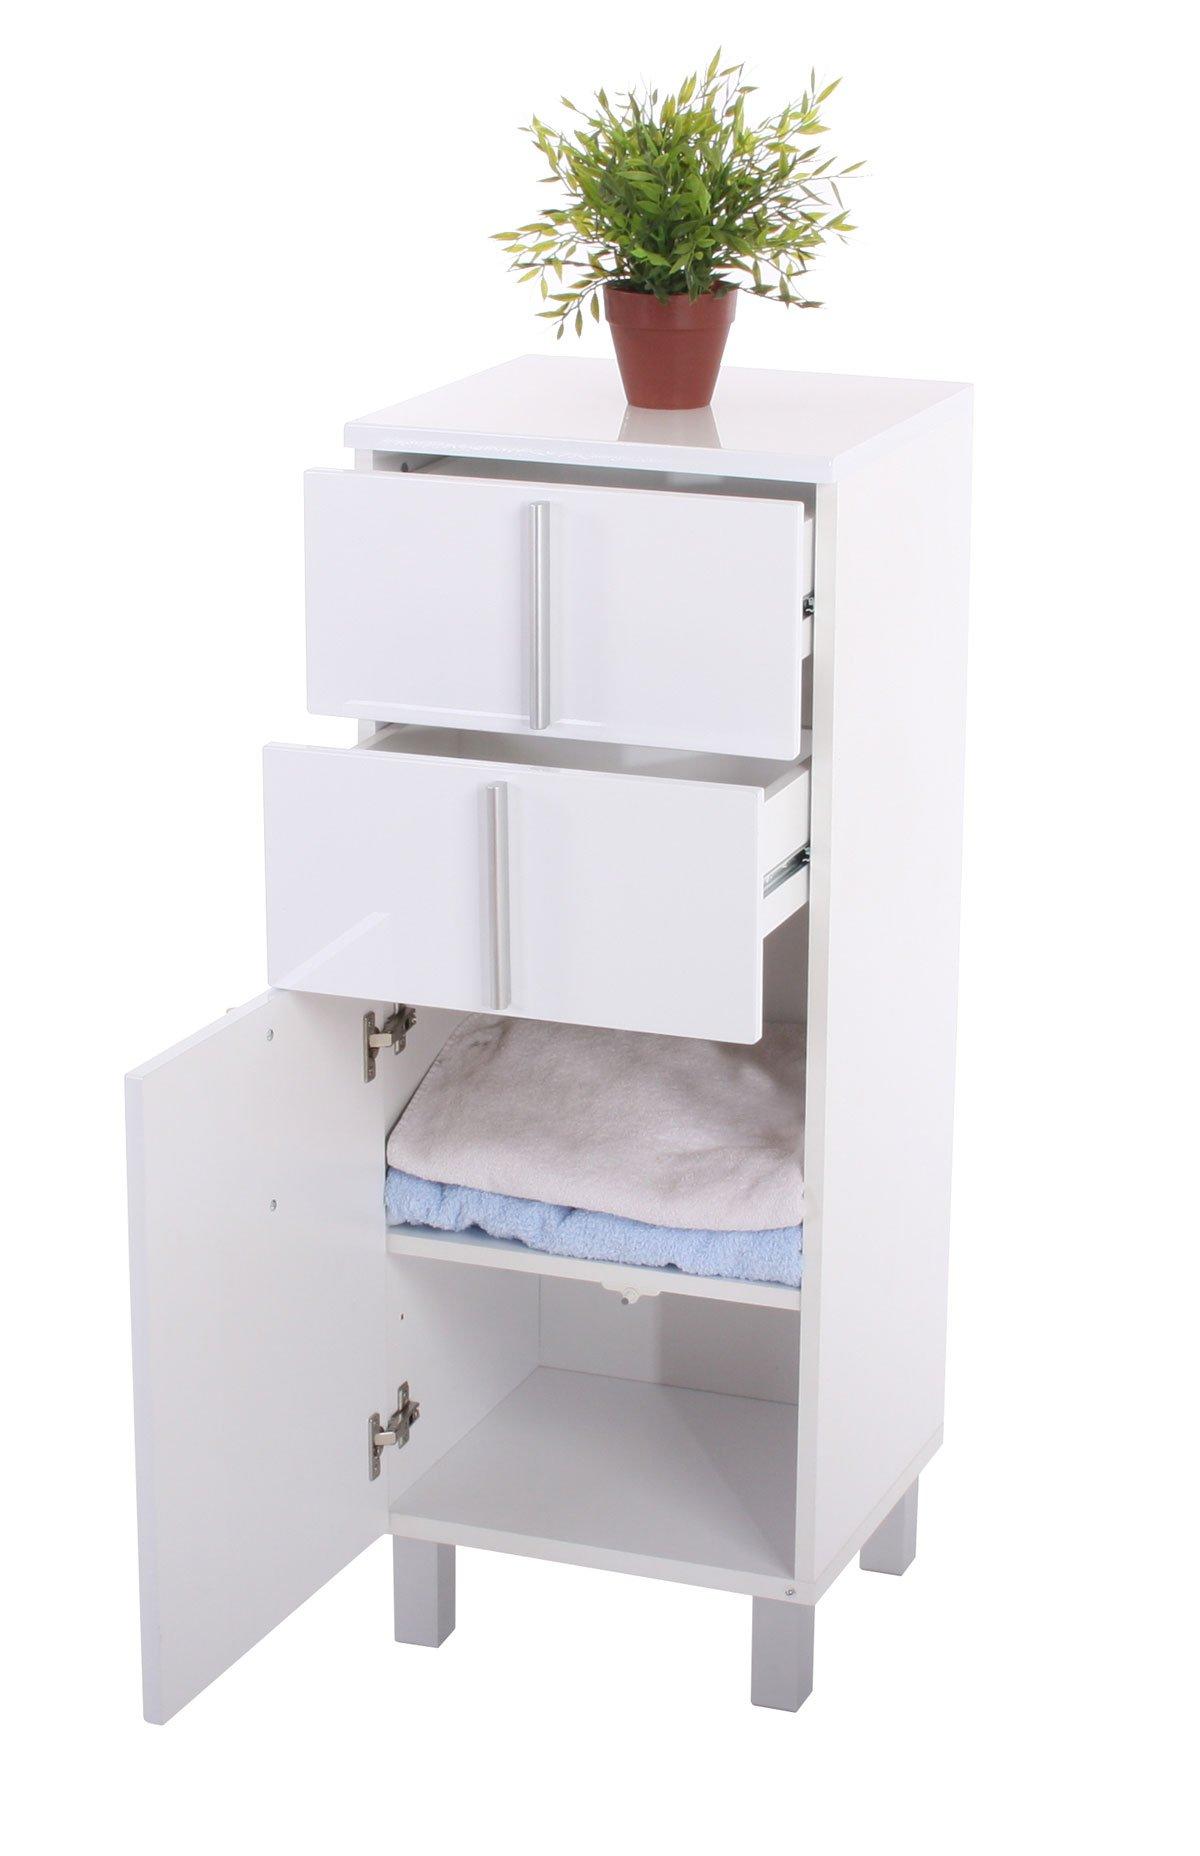 Conjunto de 3 muebles para ba o nordik 2 armarios altos for Muebles altos de bano